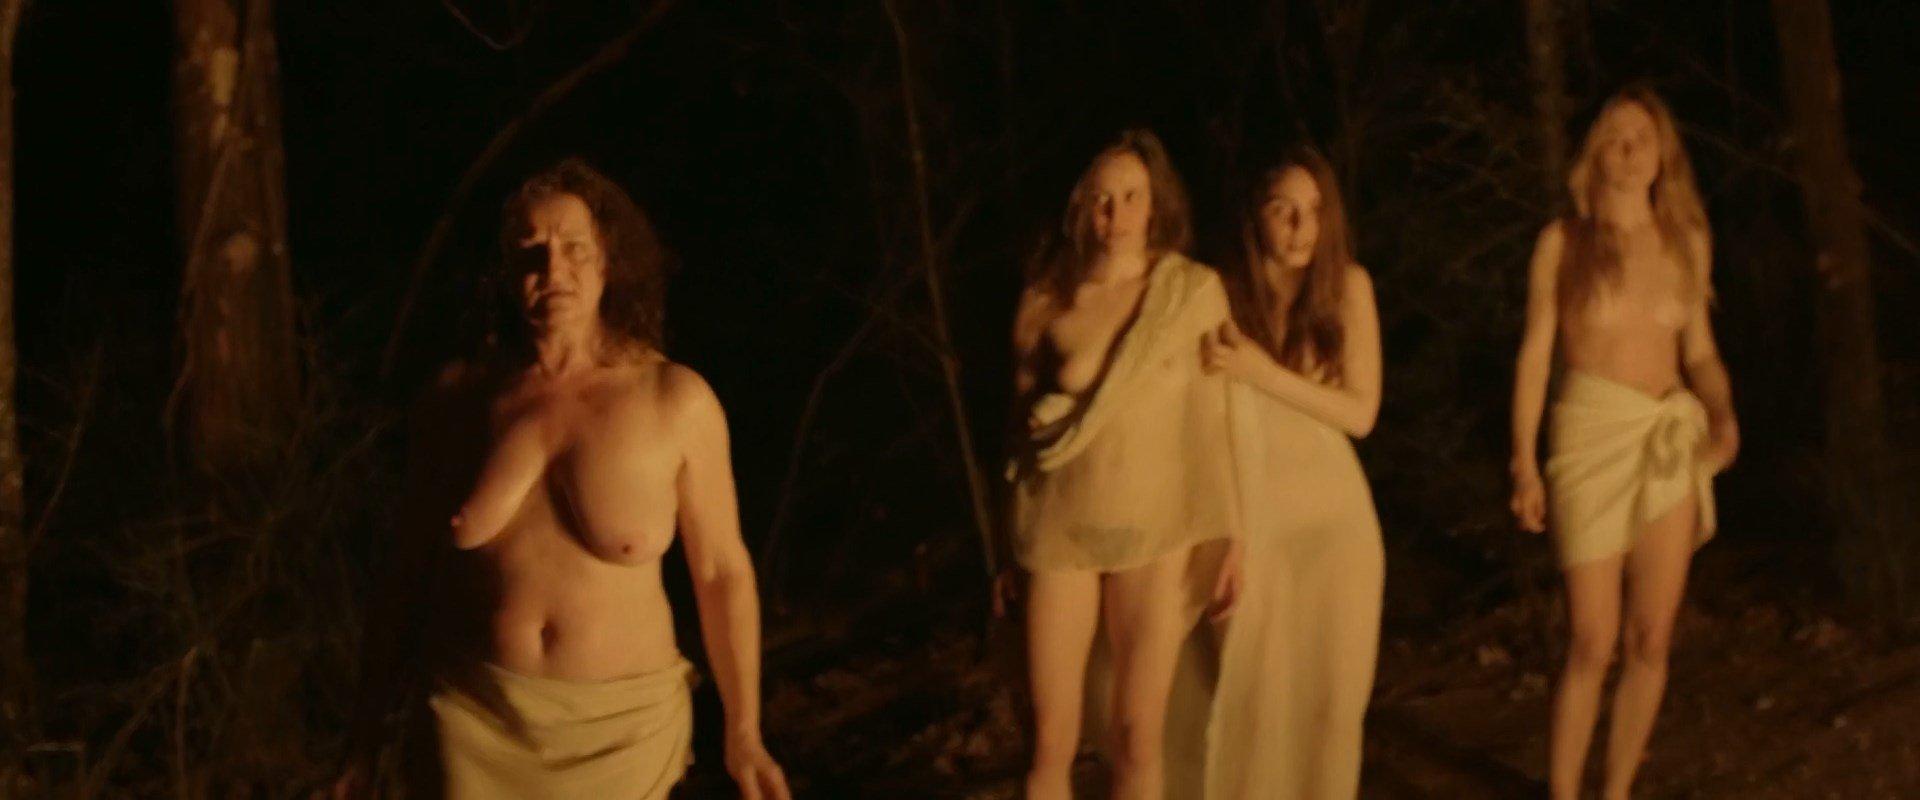 scenes nude Aubrey plaza